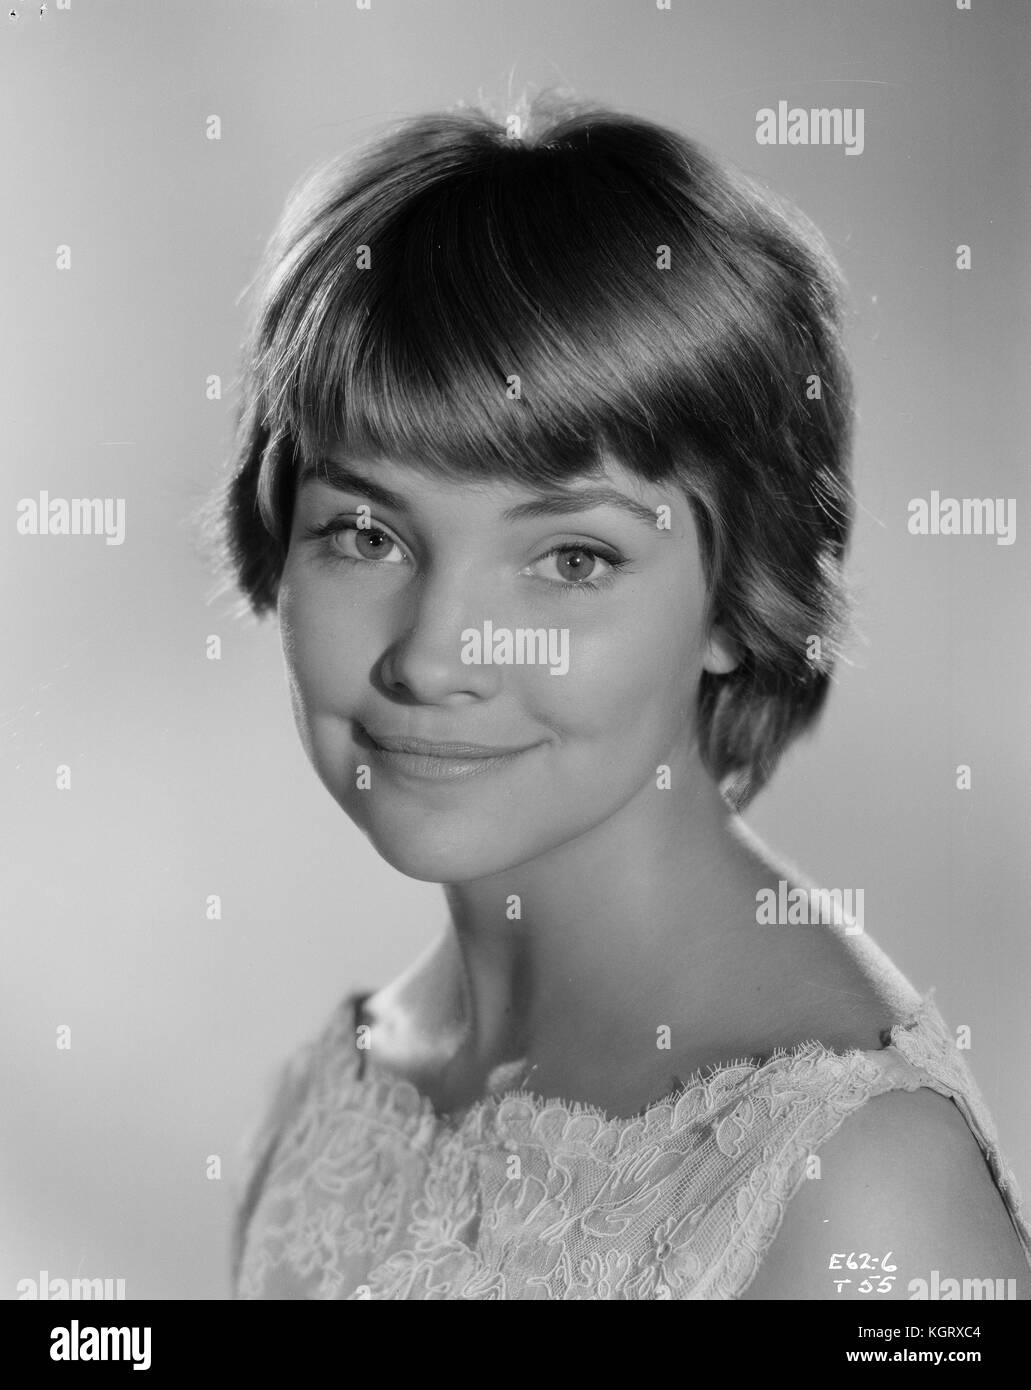 Shanice Banton Shanice Banton new picture